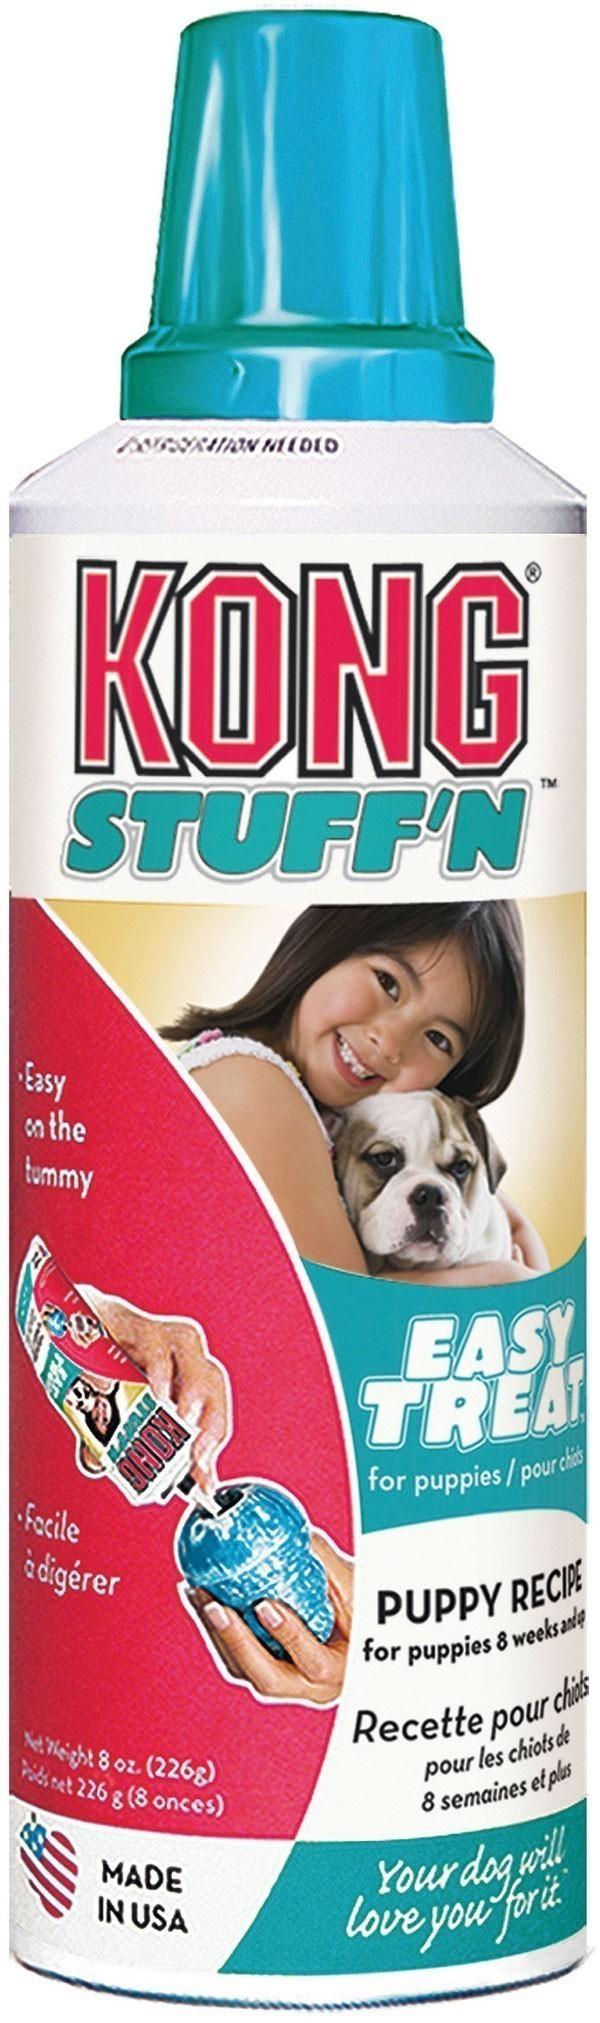 Kong Hundesnack Stuff'n Paste Puppy Treat 226g Bild 1